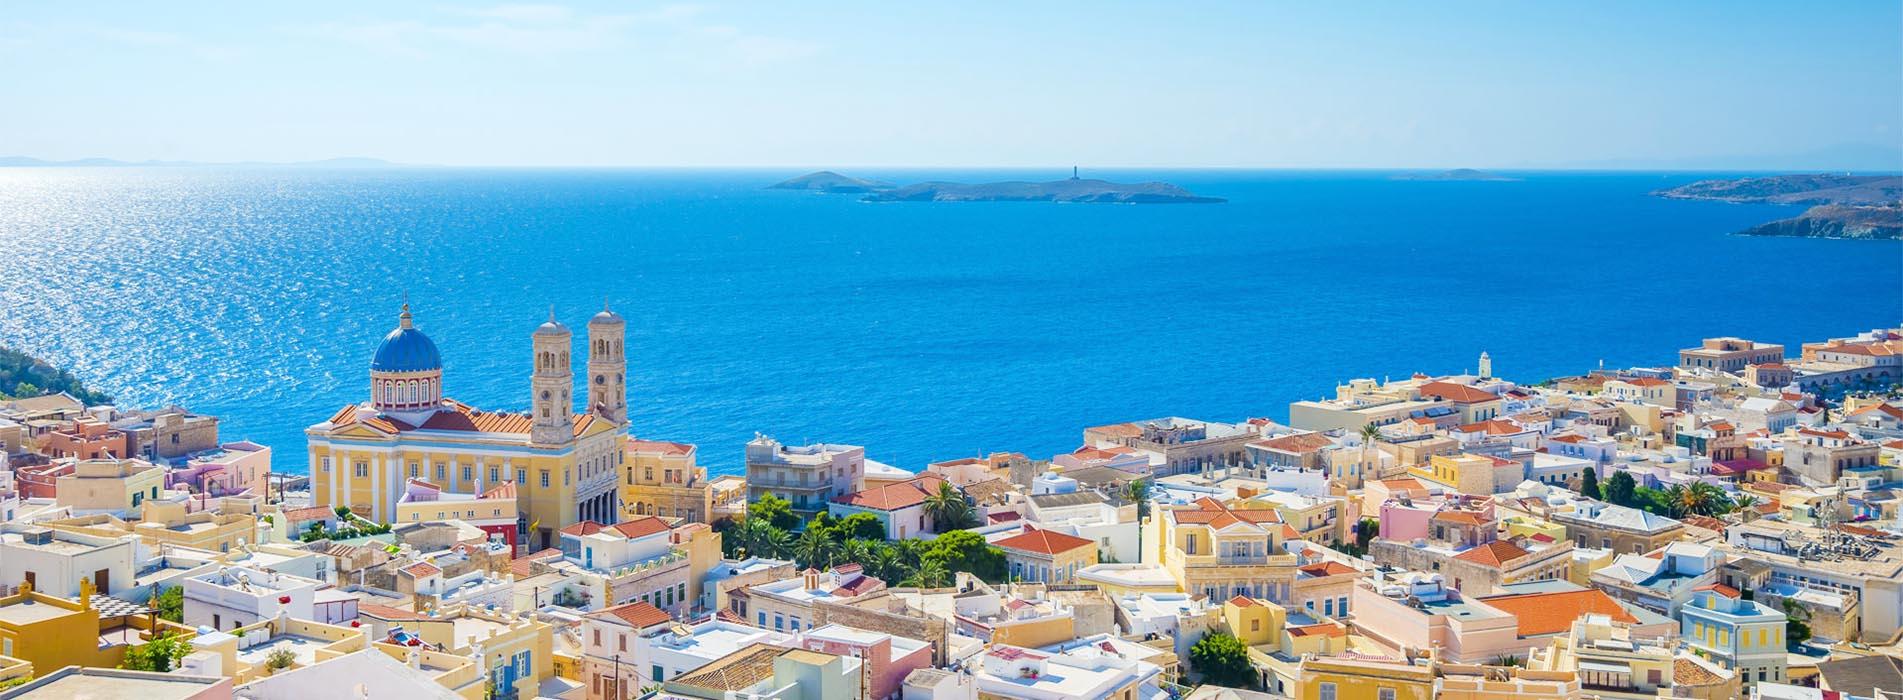 Greece - Syros 3 (main)